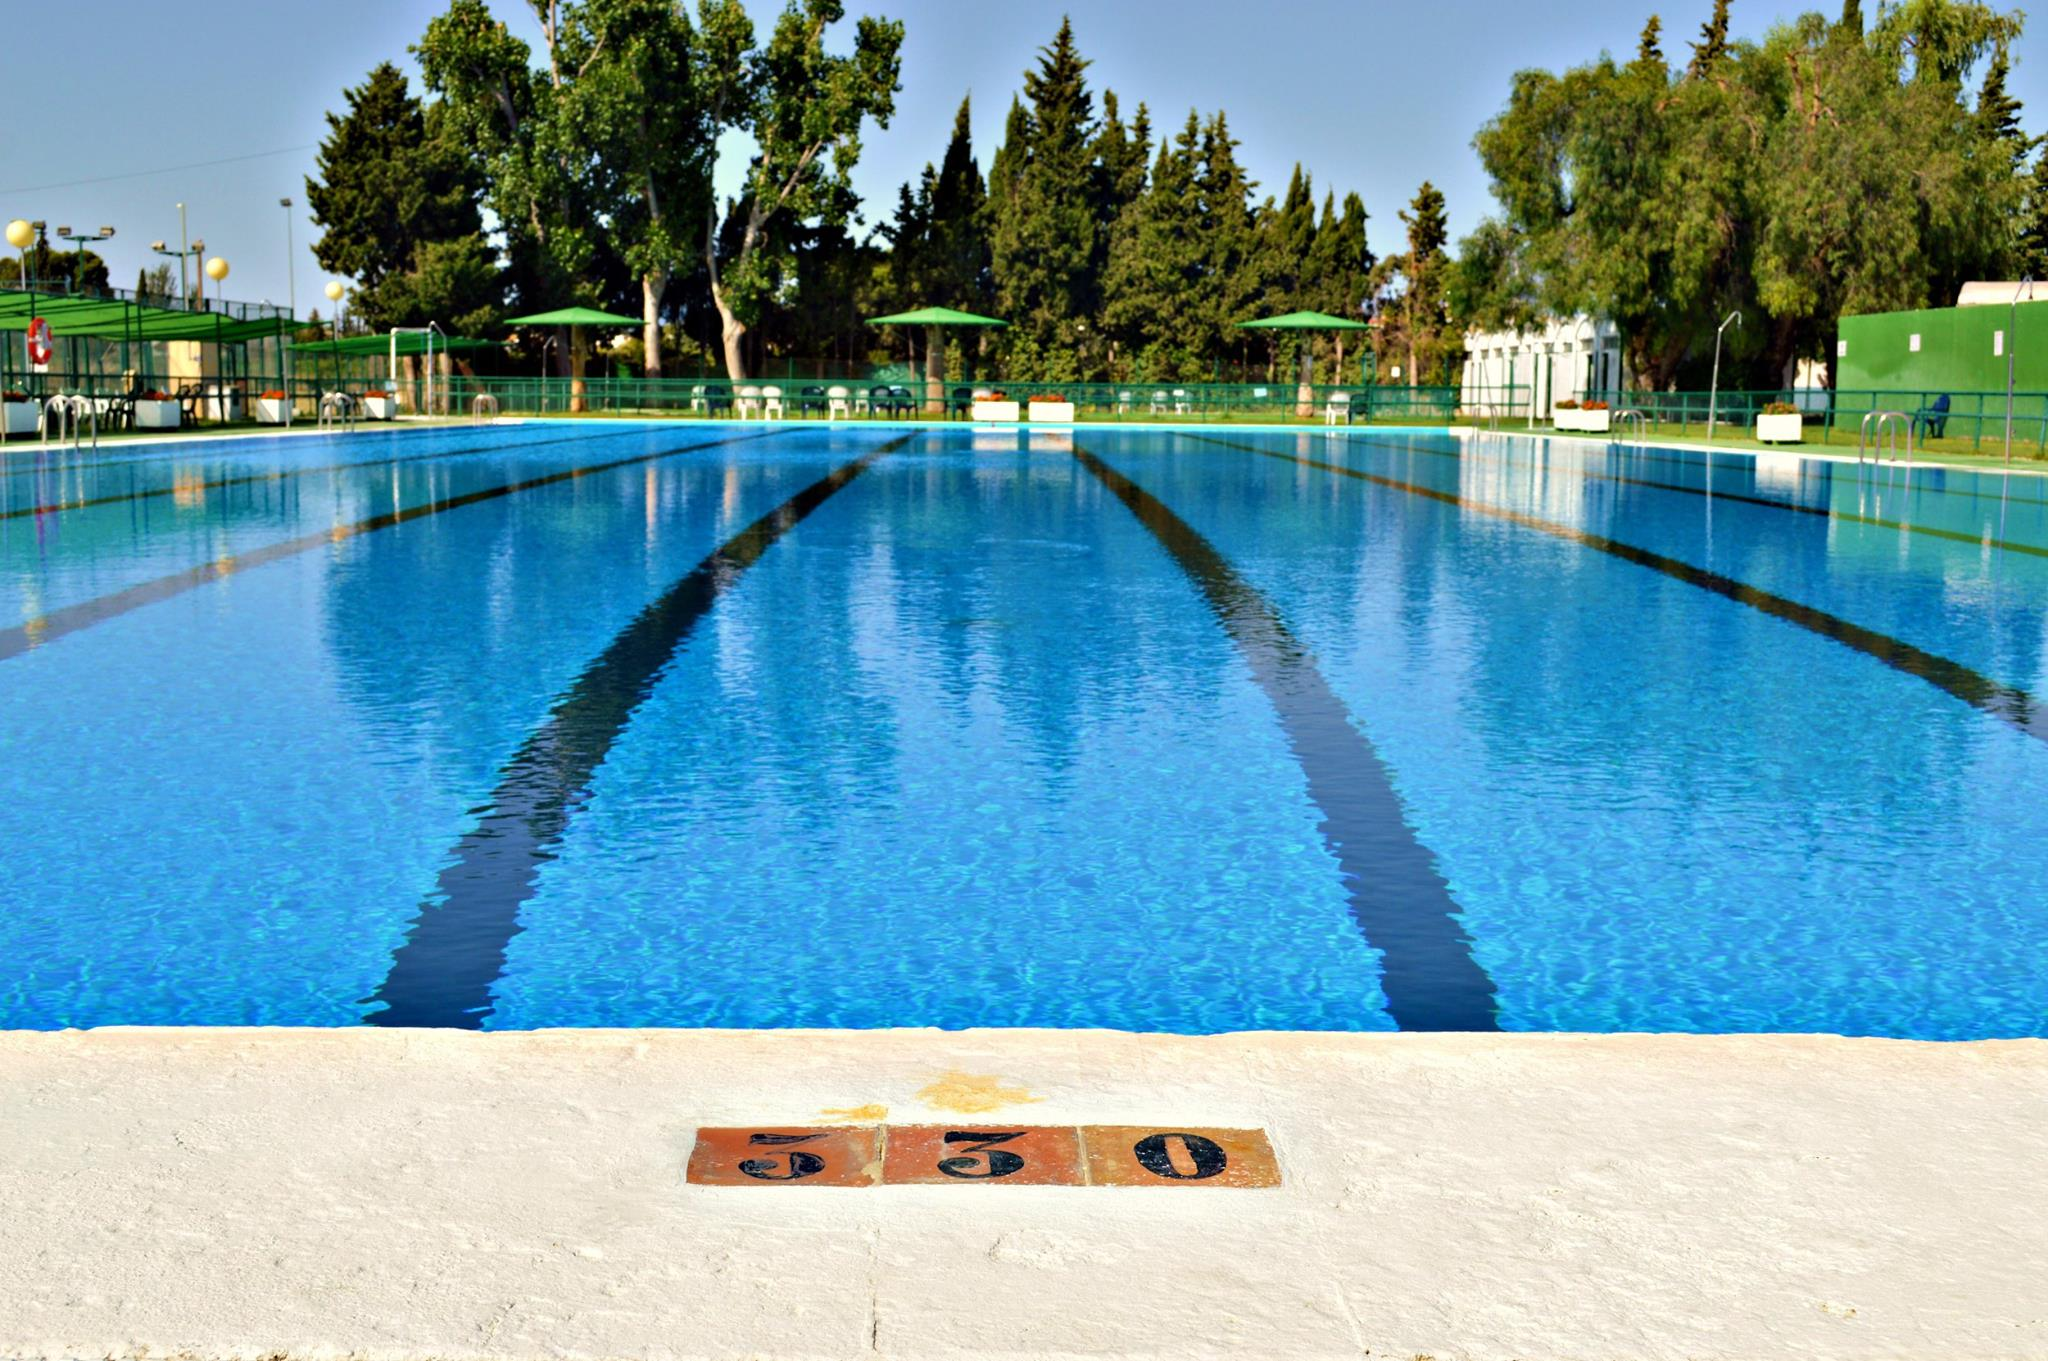 La piscina municipal de verano abre sus puertas ma ana for Piscina municipal